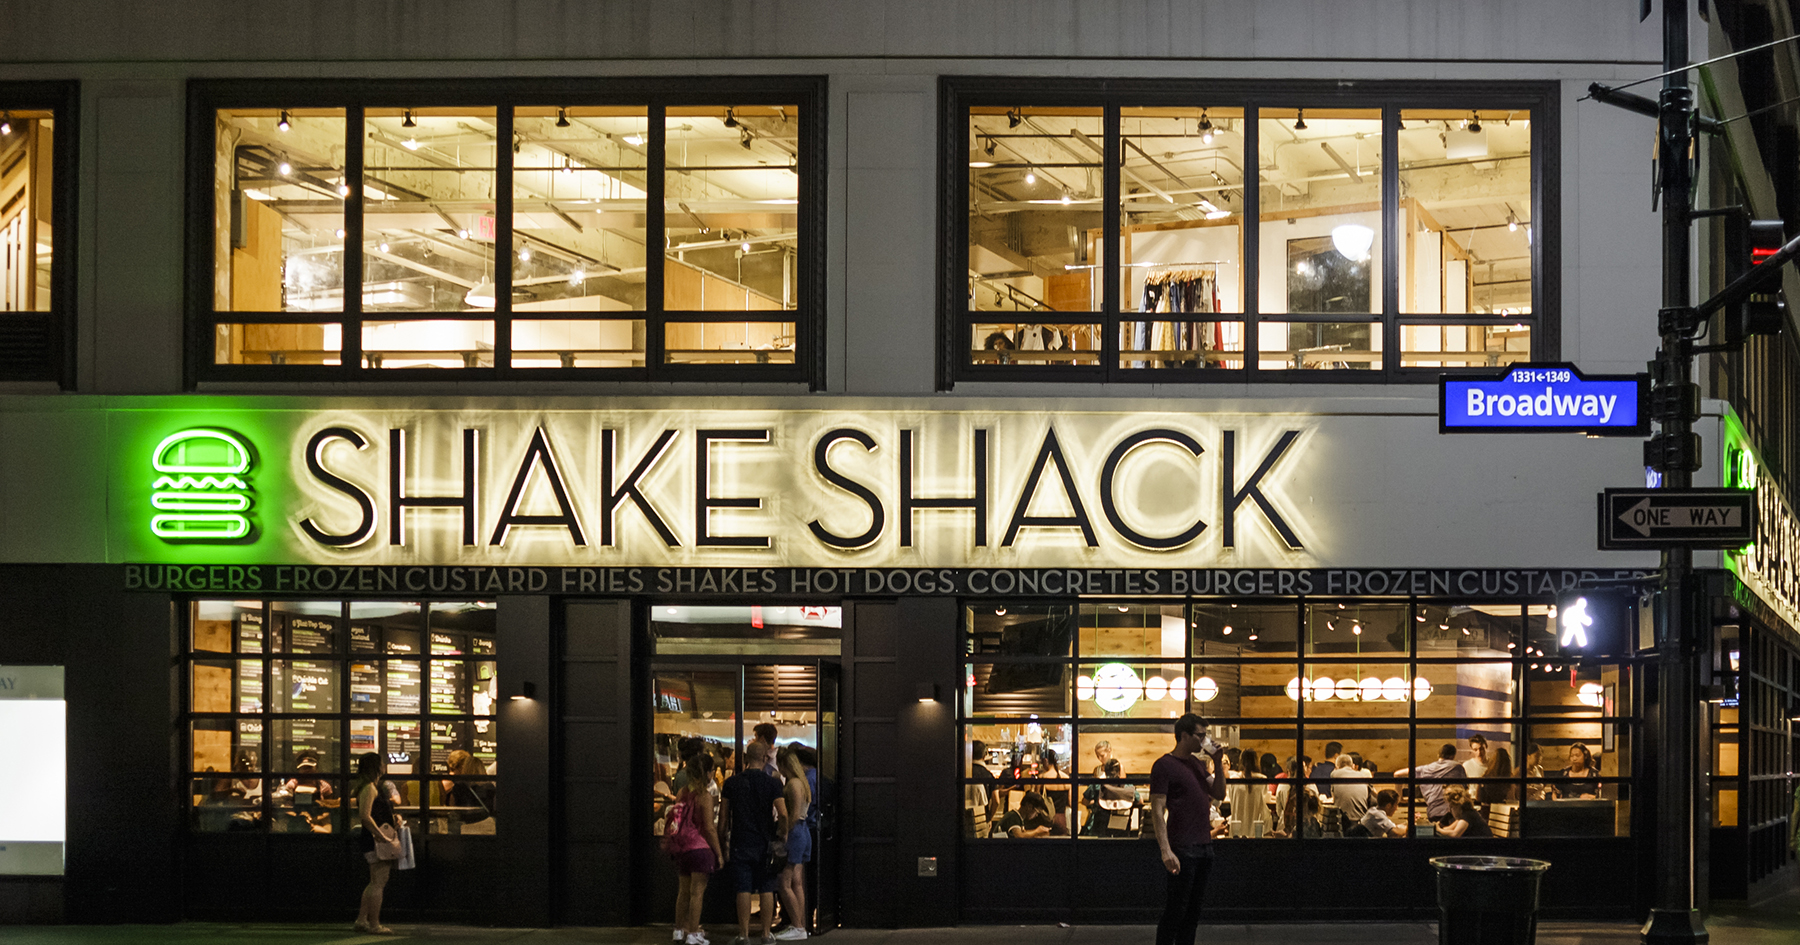 Shake shack coupons 2019